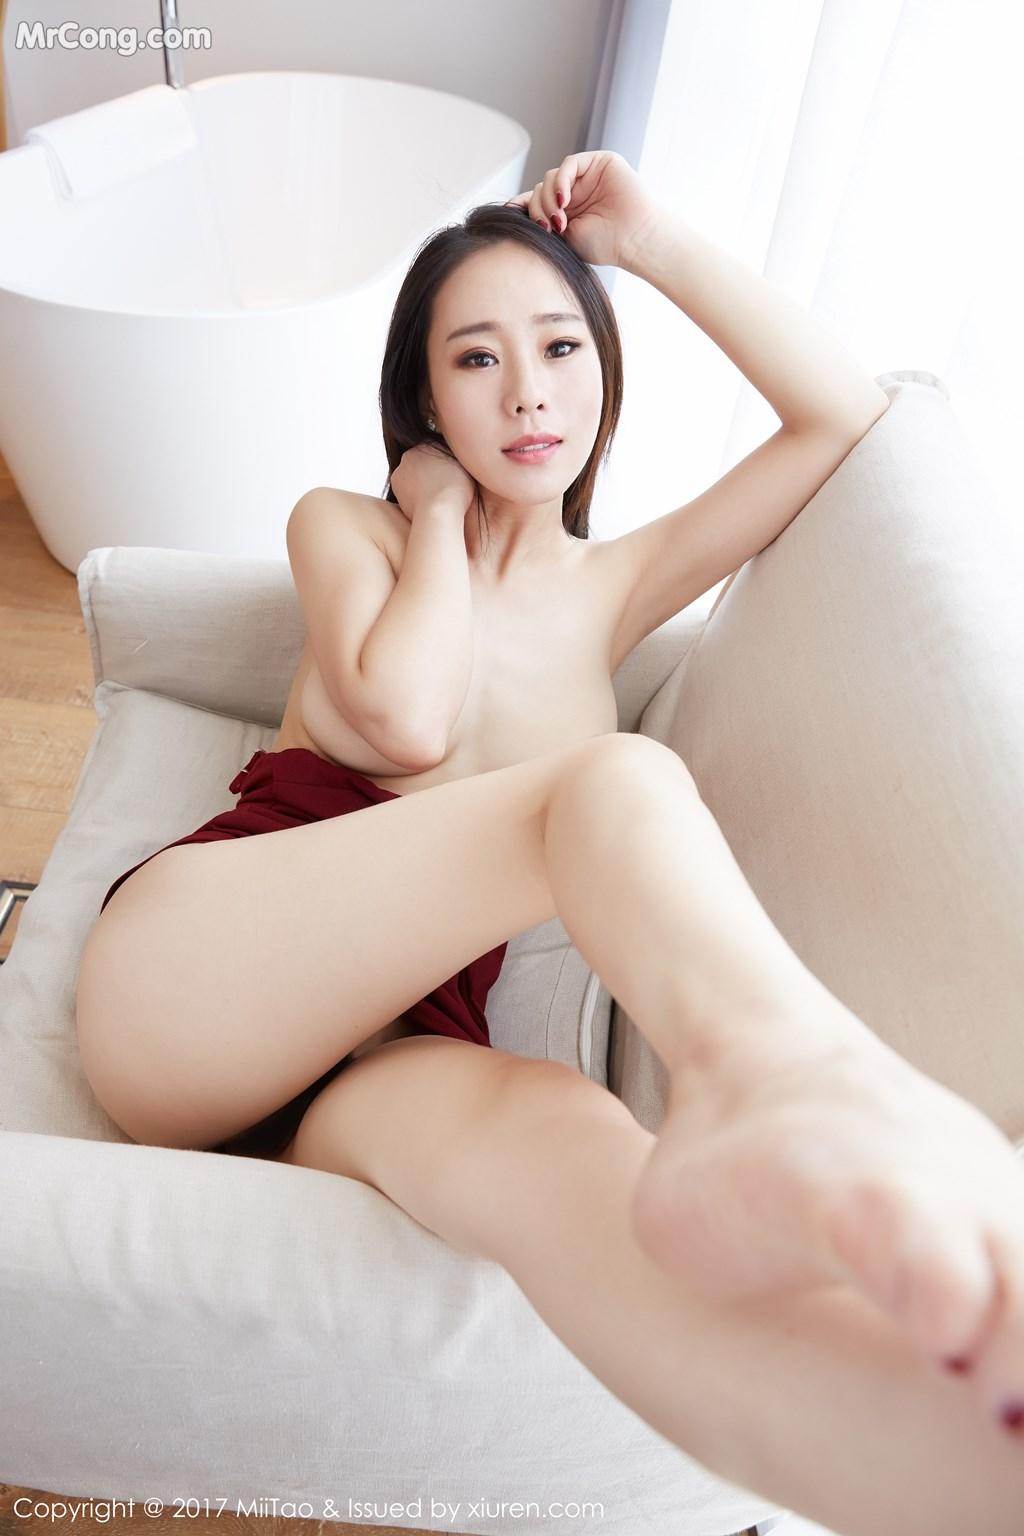 Image MiiTao-Vol.079-Yu-Wei-MrCong.com-027 in post MiiTao Vol.079: Người mẫu Yu Wei (雨薇) (54 ảnh)